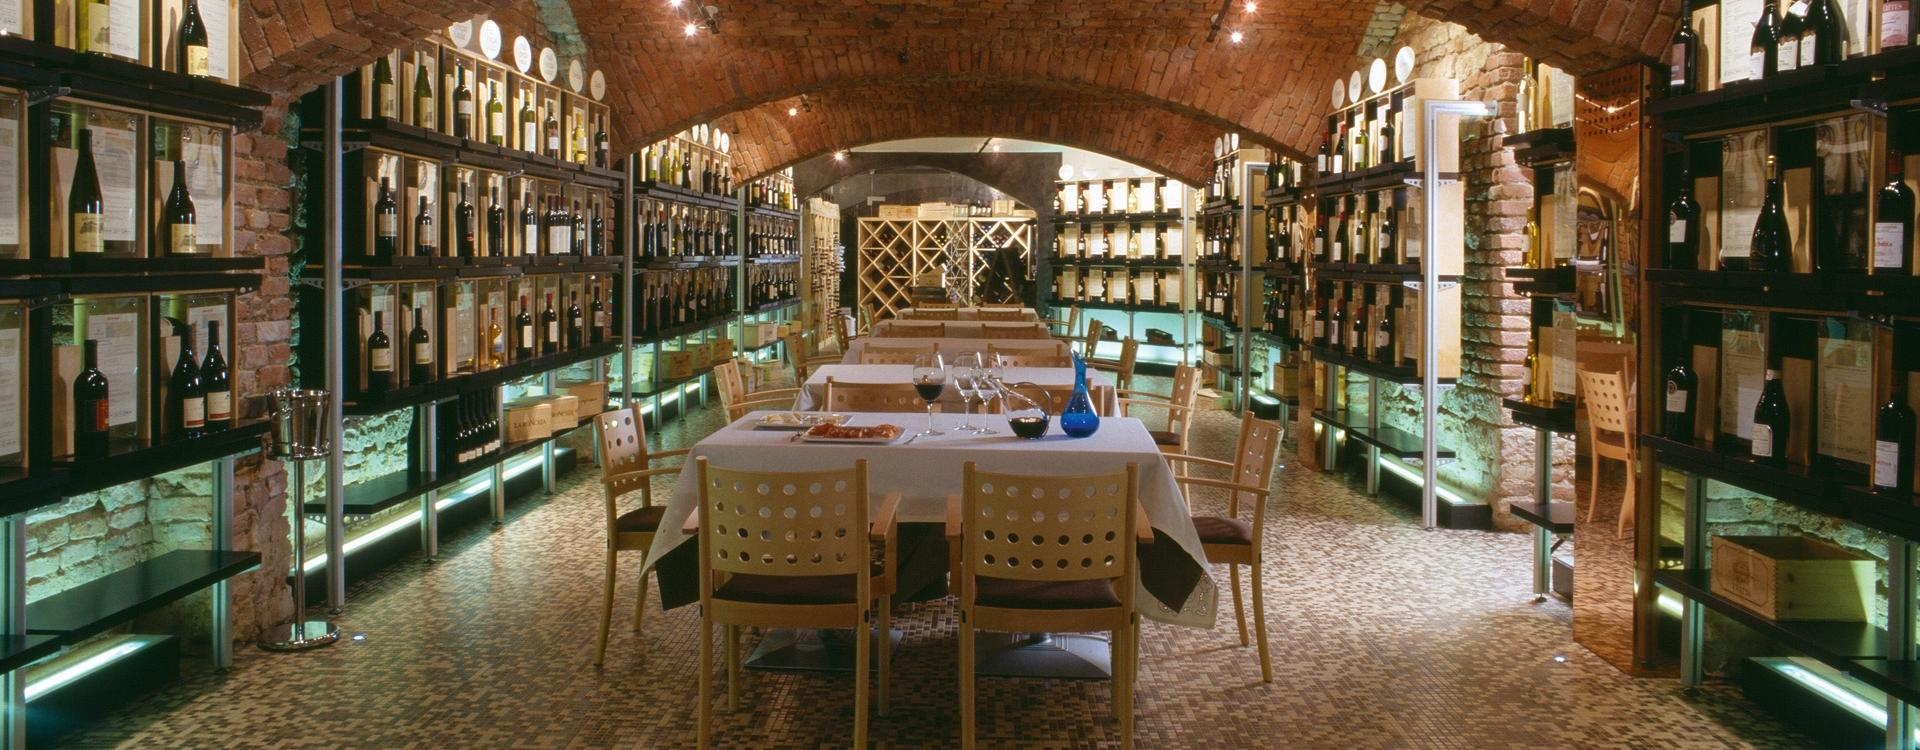 Winery VinoDivino, Prague, Czech Republic